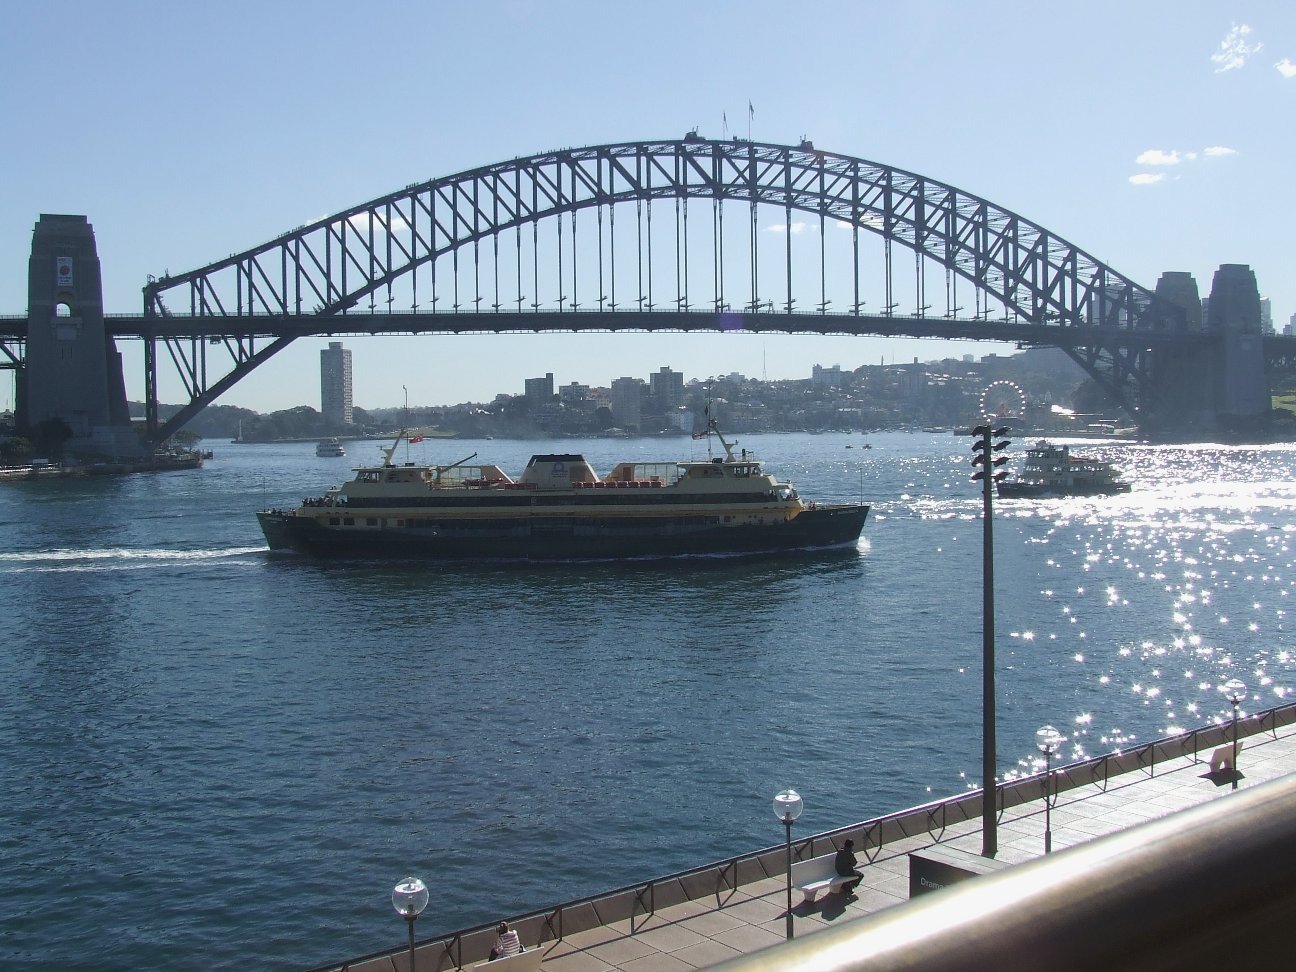 Datei:Sydney Harbour Bridge from the Opera House.jpg ...